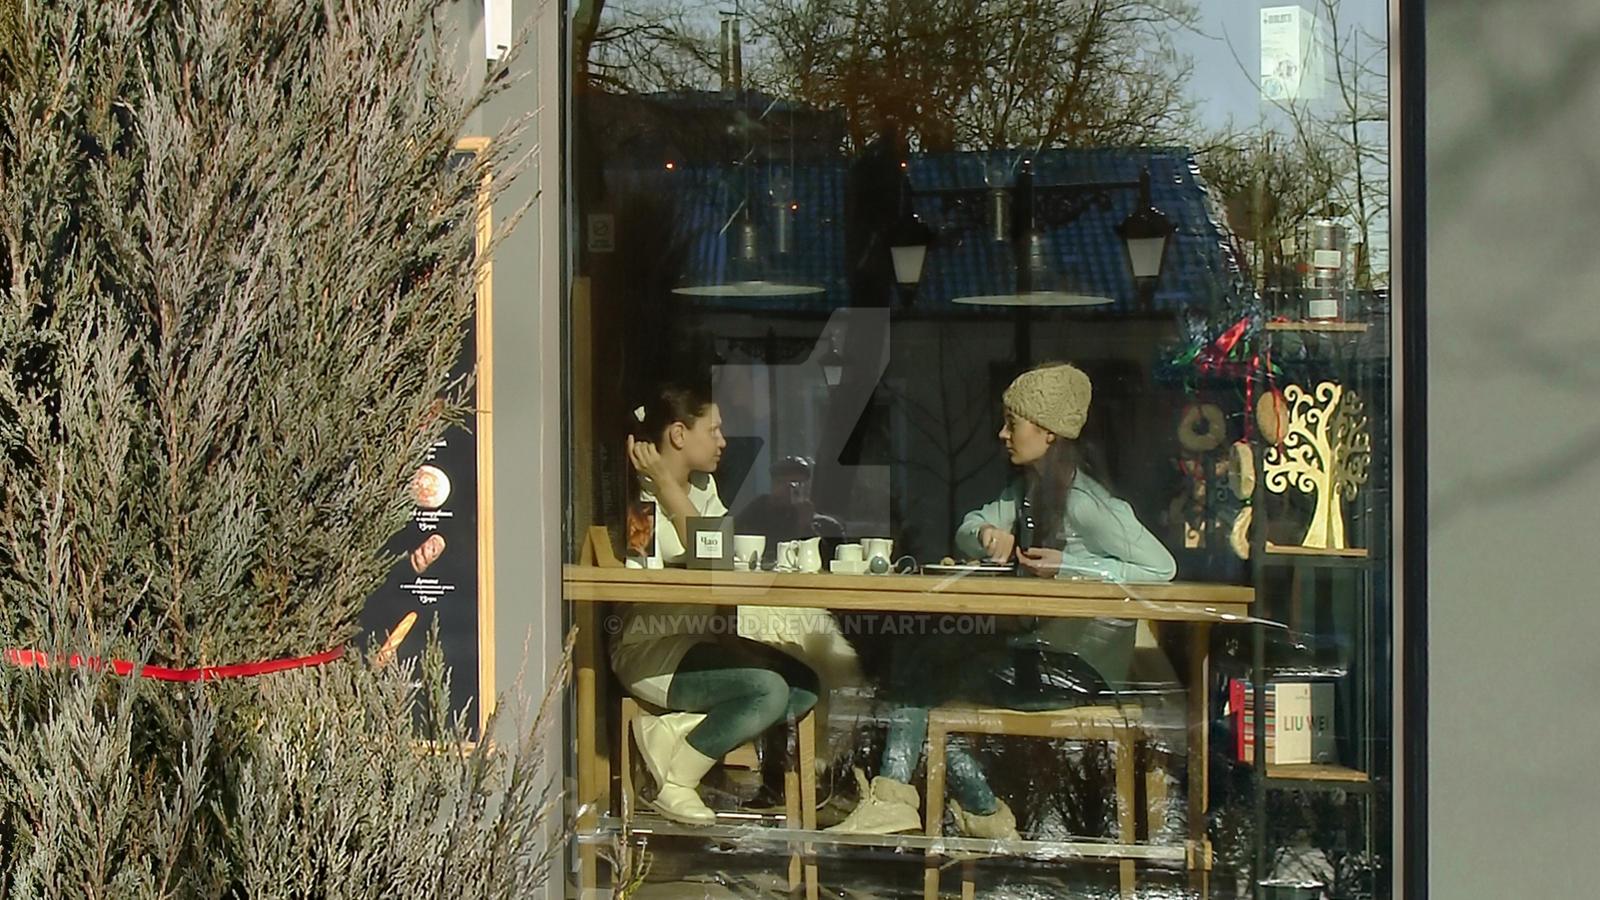 Gorky St. in Simferopol, 17.01. 2014. Detail 2 by anyword